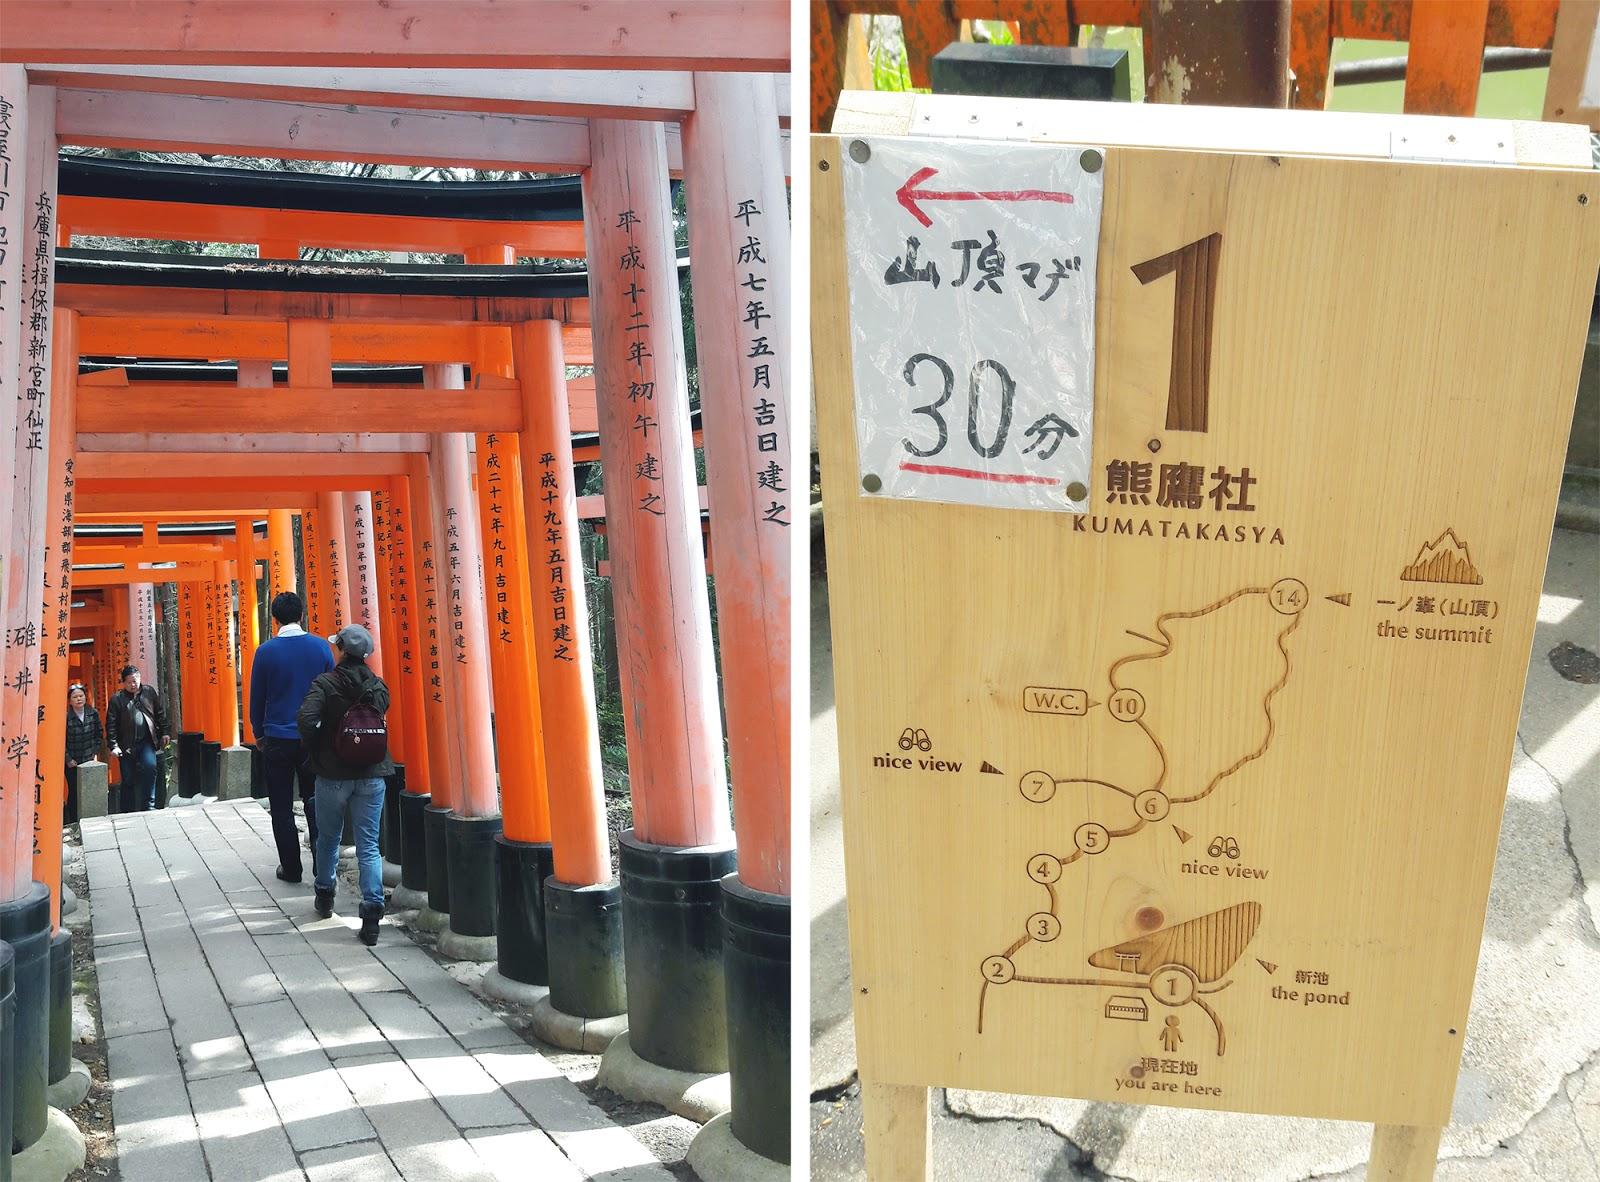 Climb Fushimi Inari Kyoto | www.bigdreamerblog.com